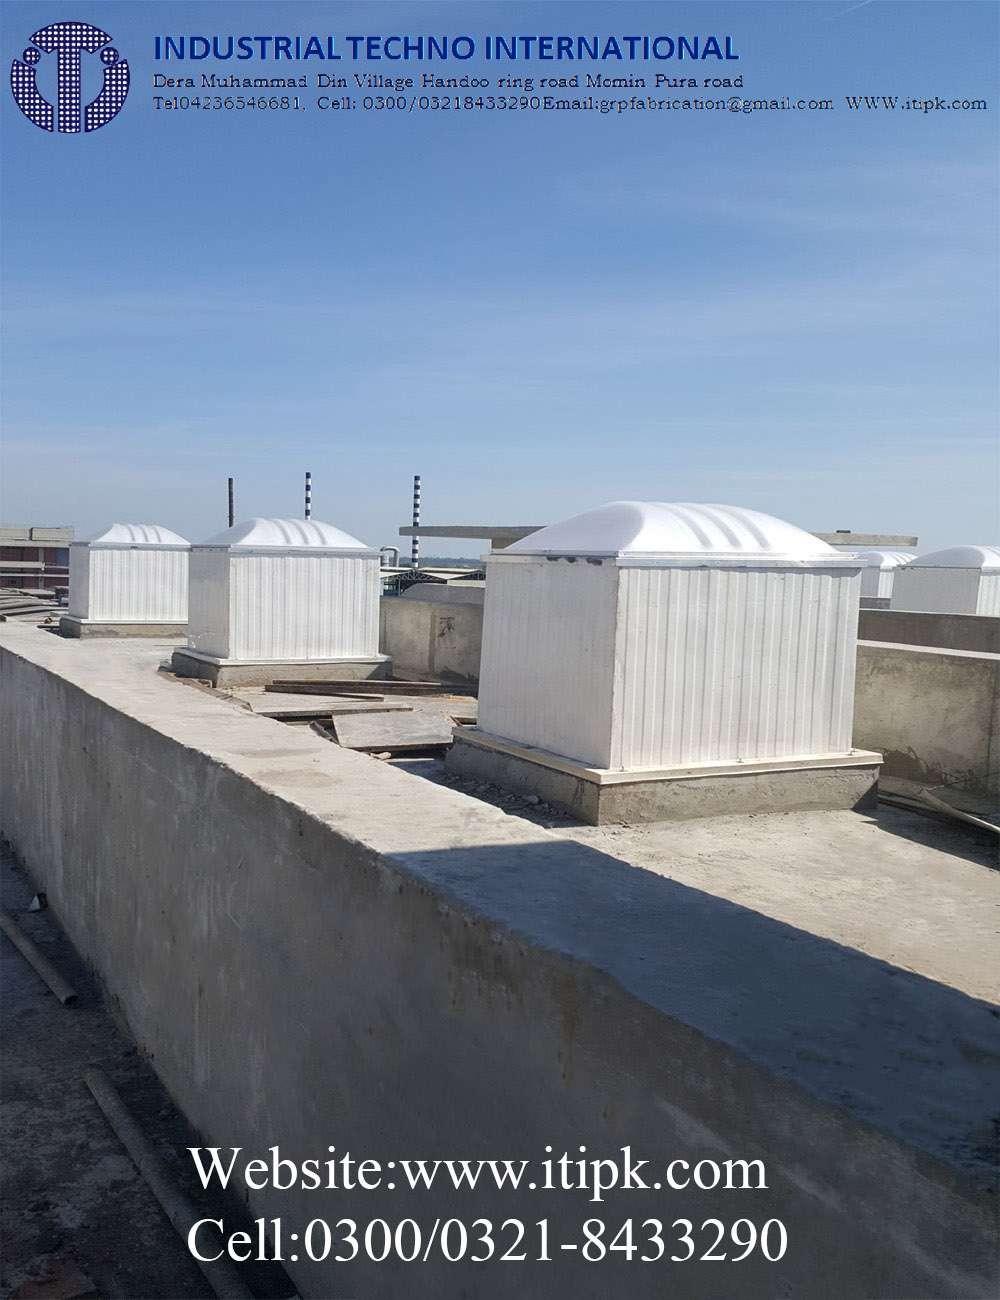 Fiberglass roofing Curb concrete roof,  Size 4' x 4' x 4'